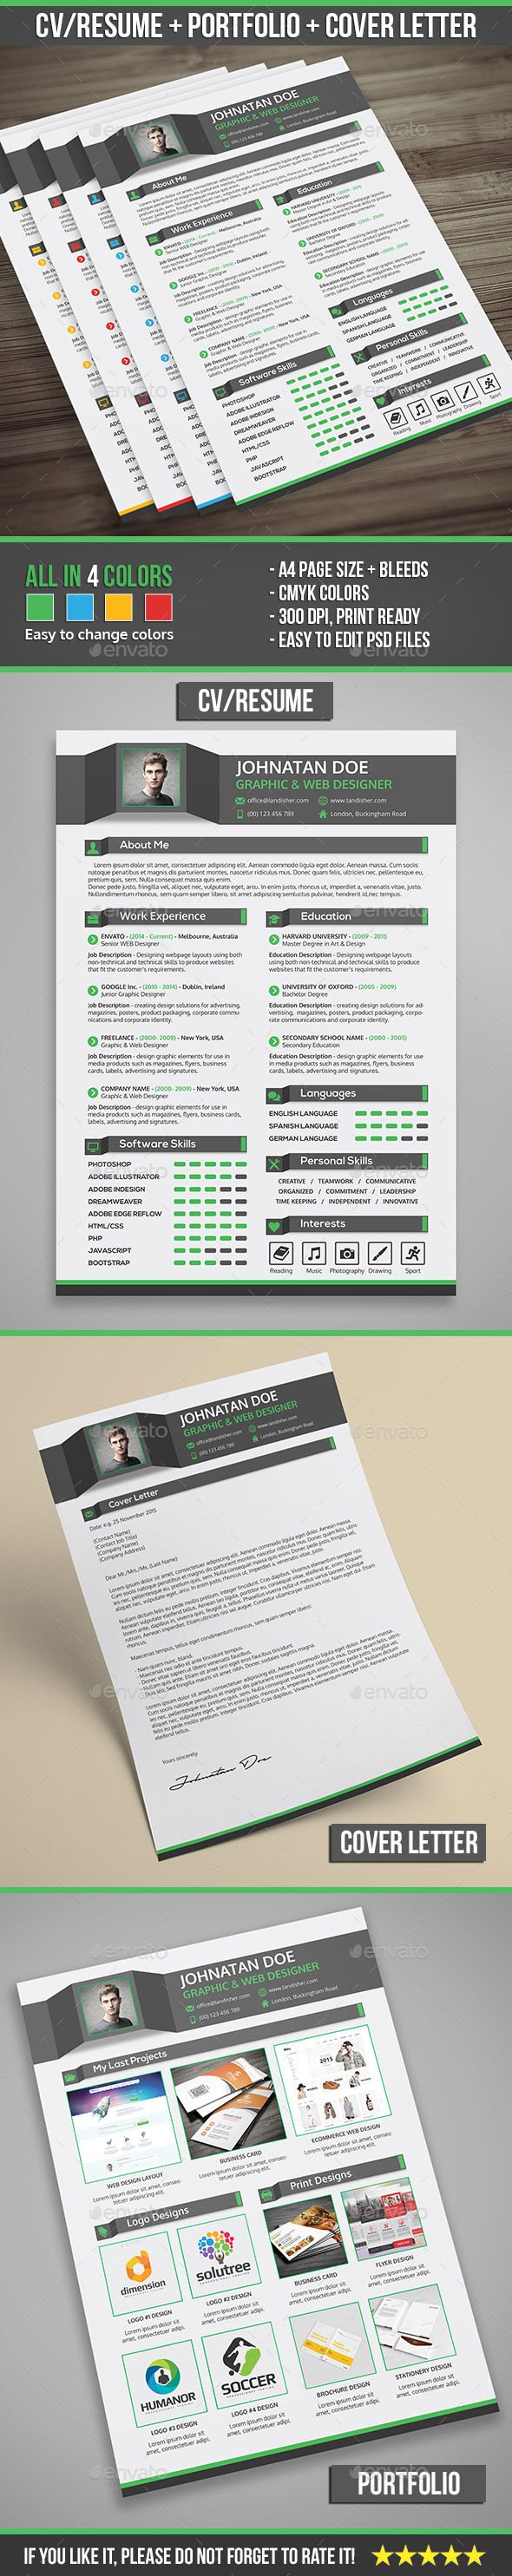 Creative Professional Resume CV + Cover Letter + Portfolio | Cv ...